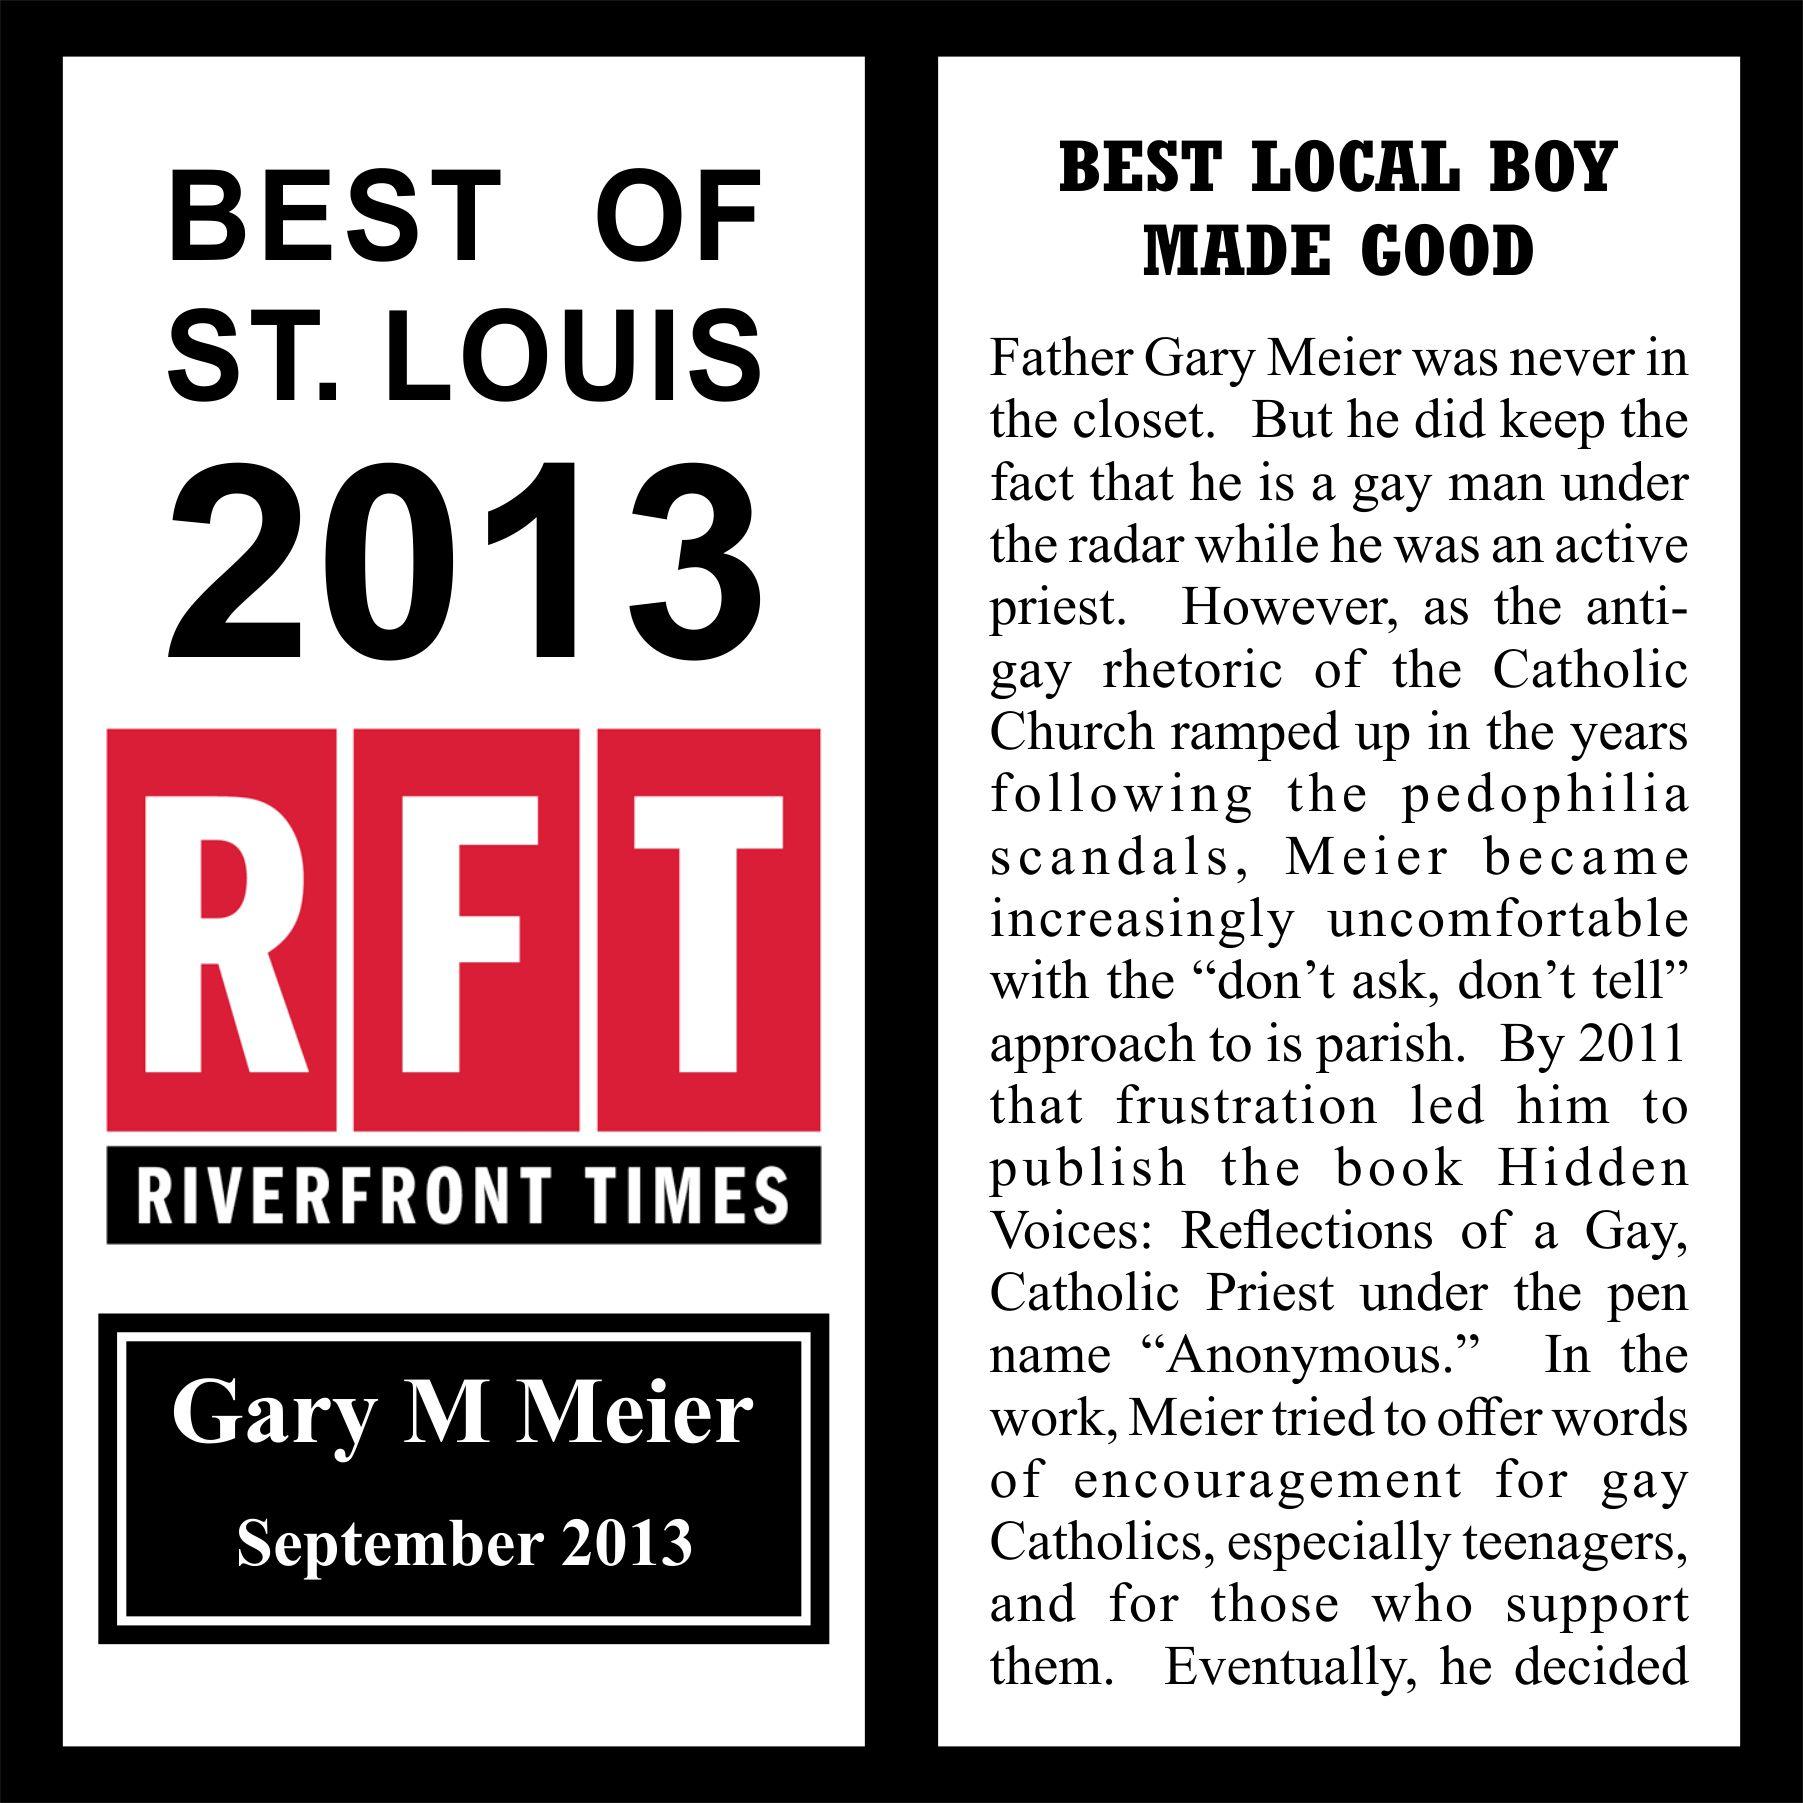 2013 Best of St. Louis Award